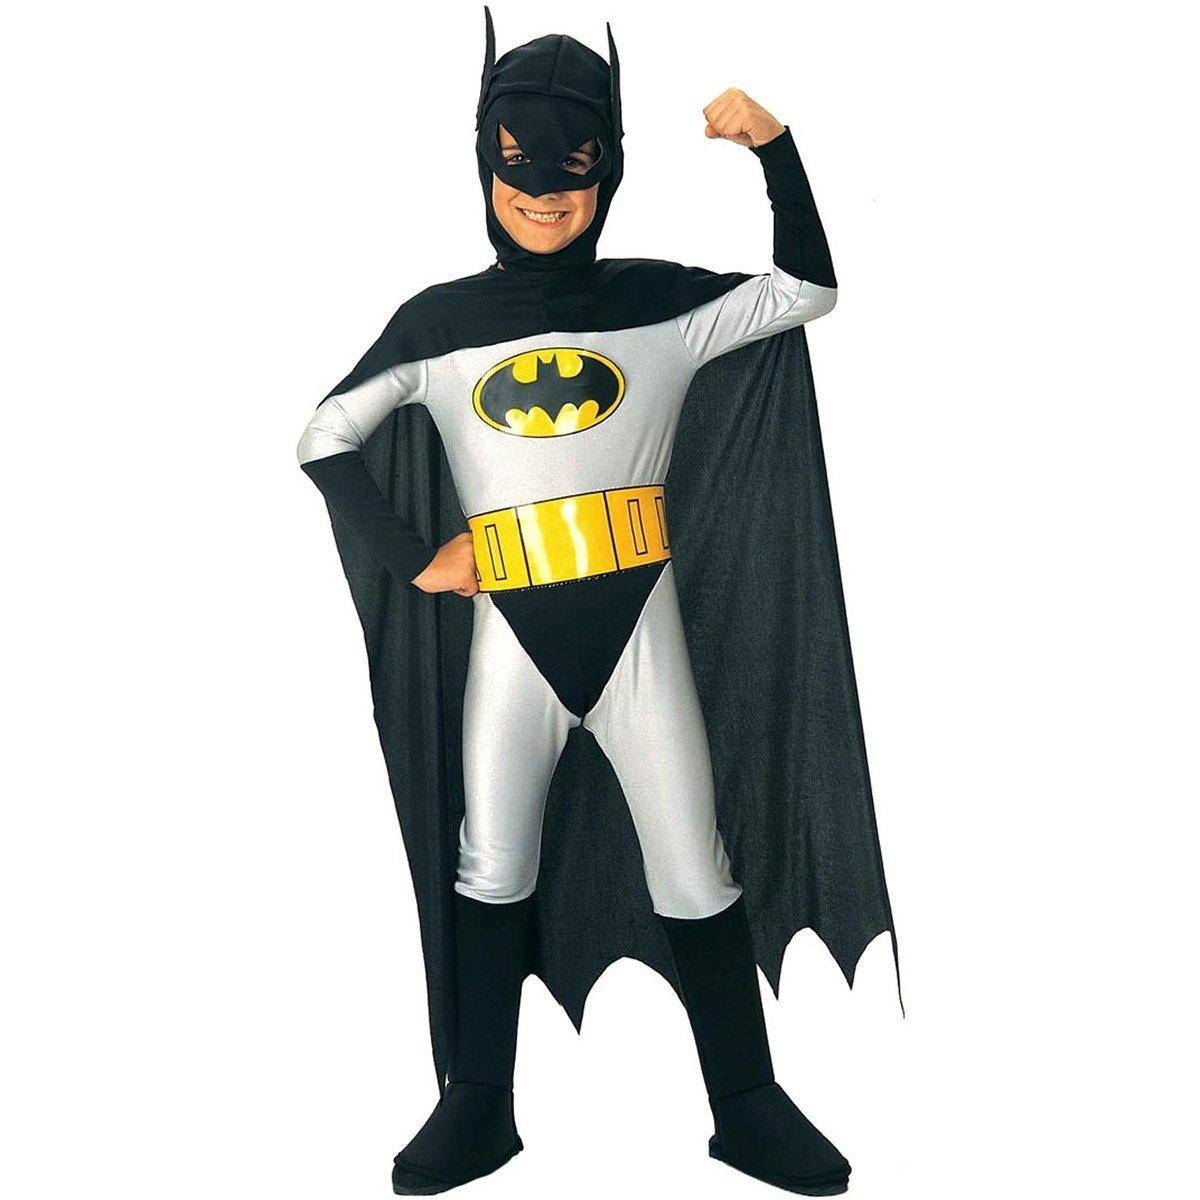 Disfraz de Heroe Bat Murciélago Infantil (Batman) Niño 7 - 9 años ...